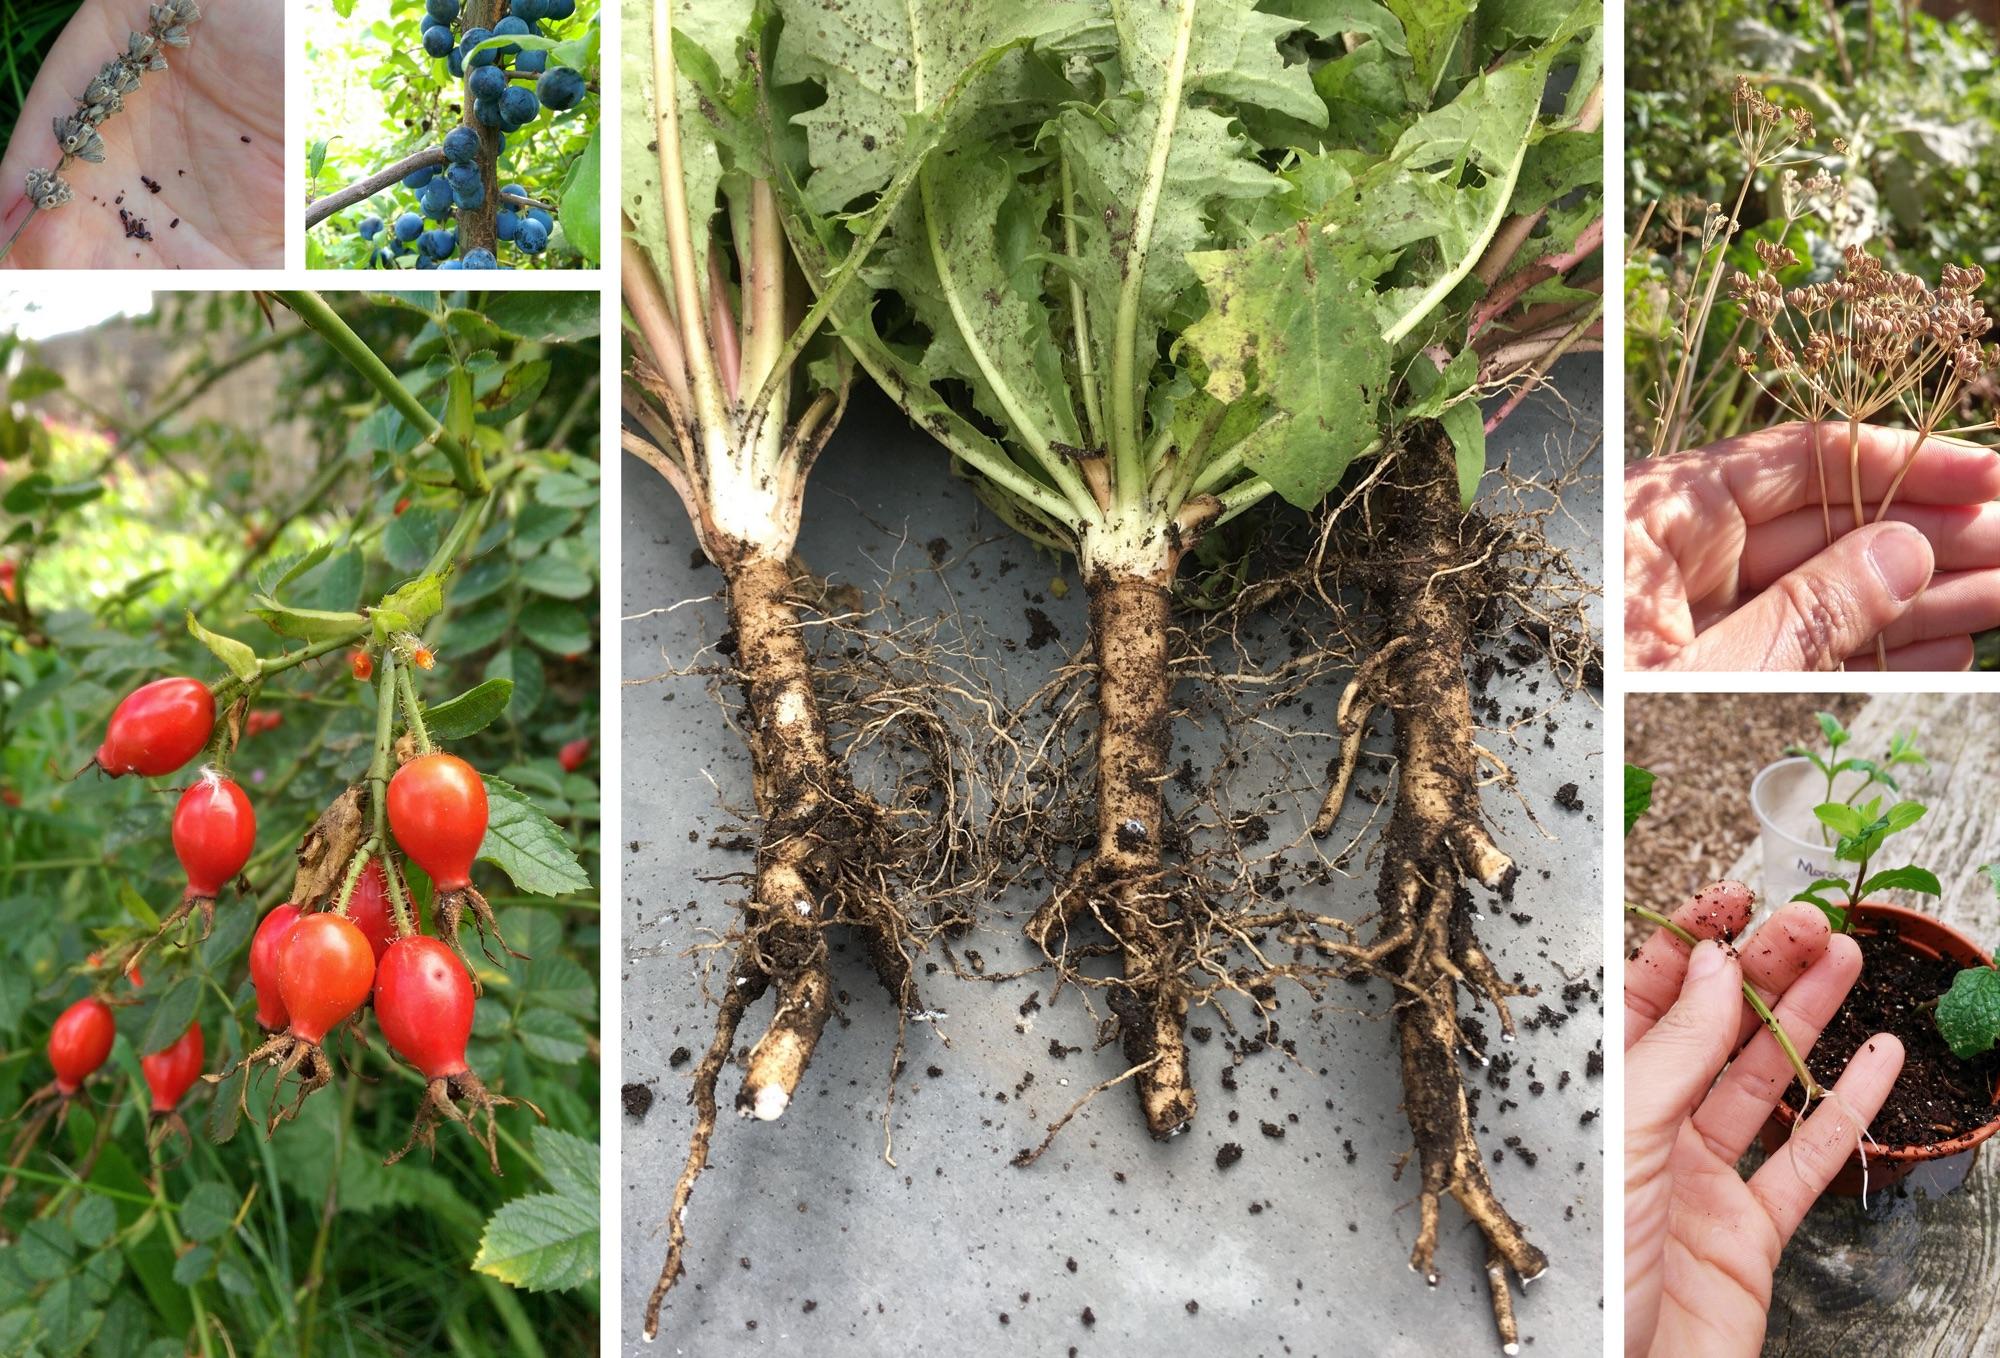 Clockwise from top right - Lavender seeds, Sloe berries, Dandelions, Parsley seed, Mint cuttings, Rose hips